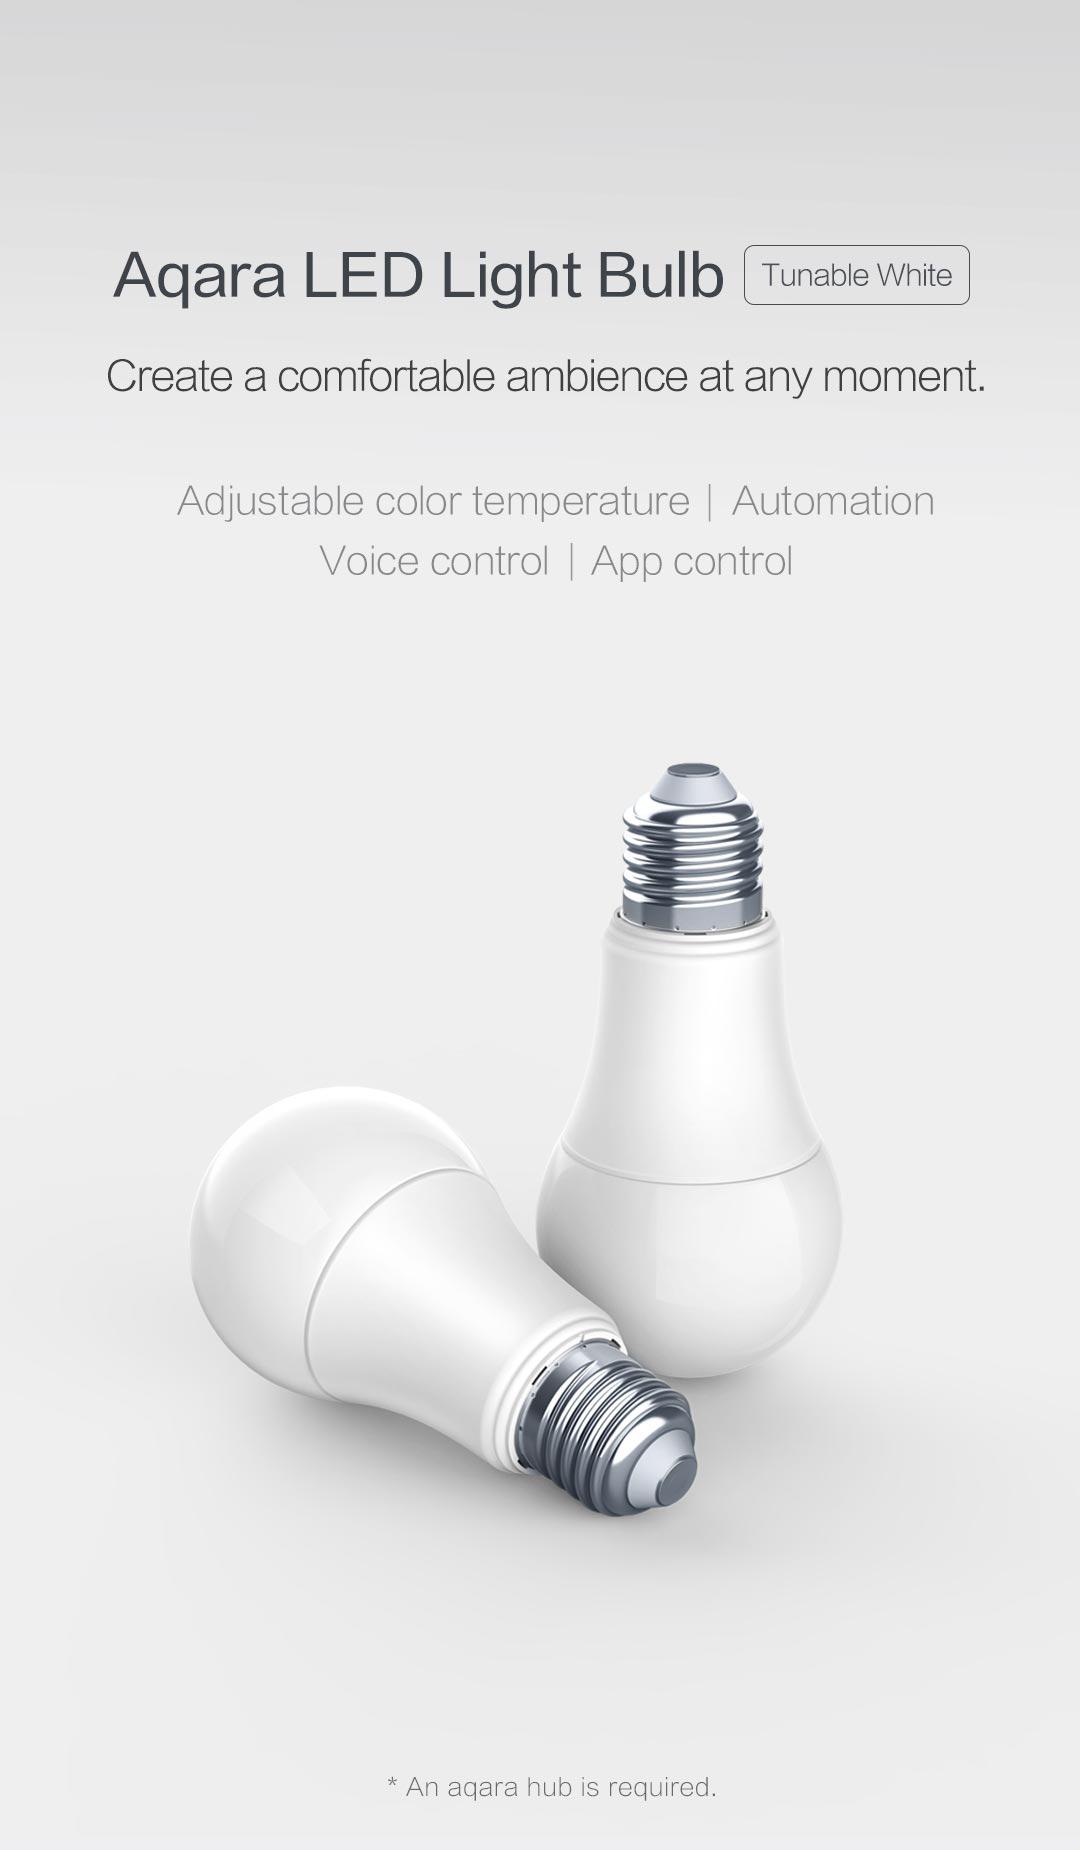 Aqara smart light bulb e27 tunable white